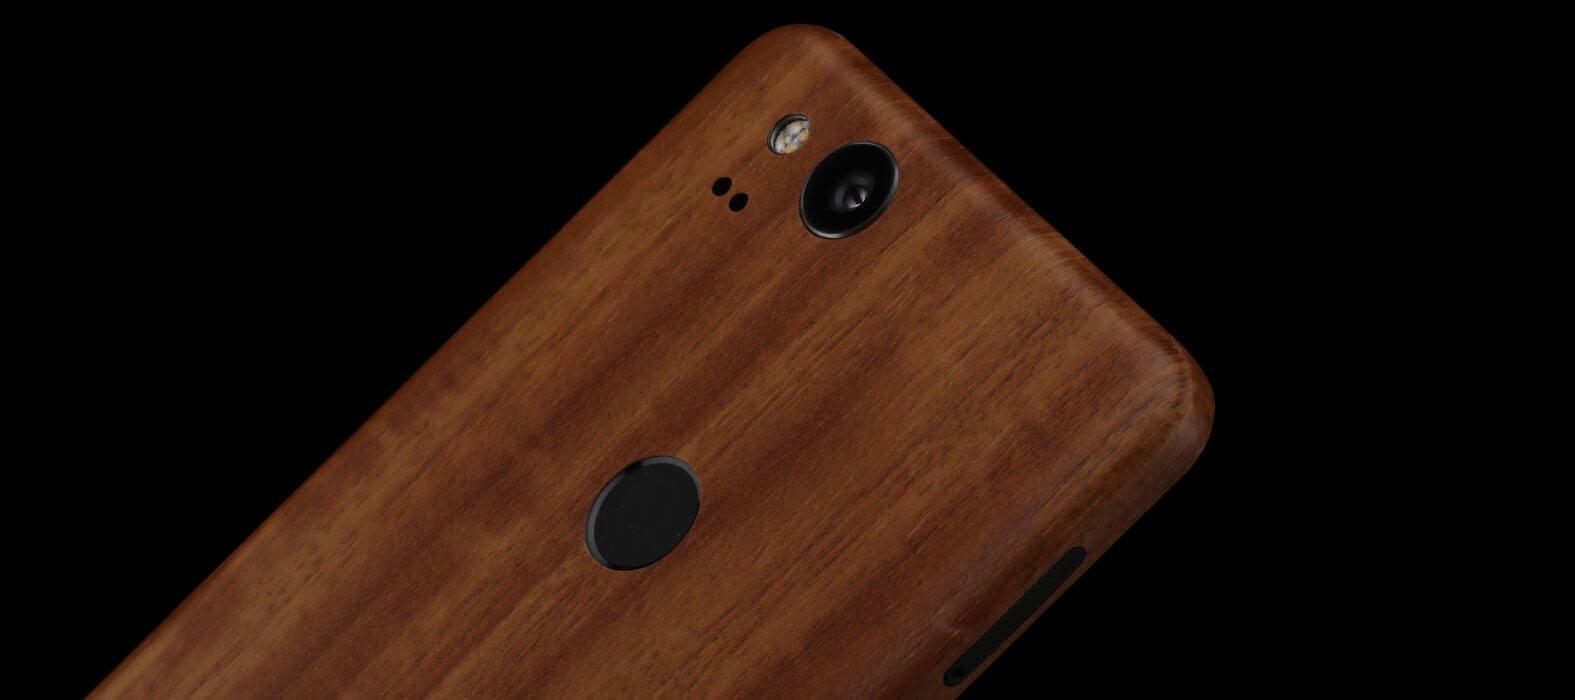 Pixel 2 Wraps, Skins, Decals - Teak wood